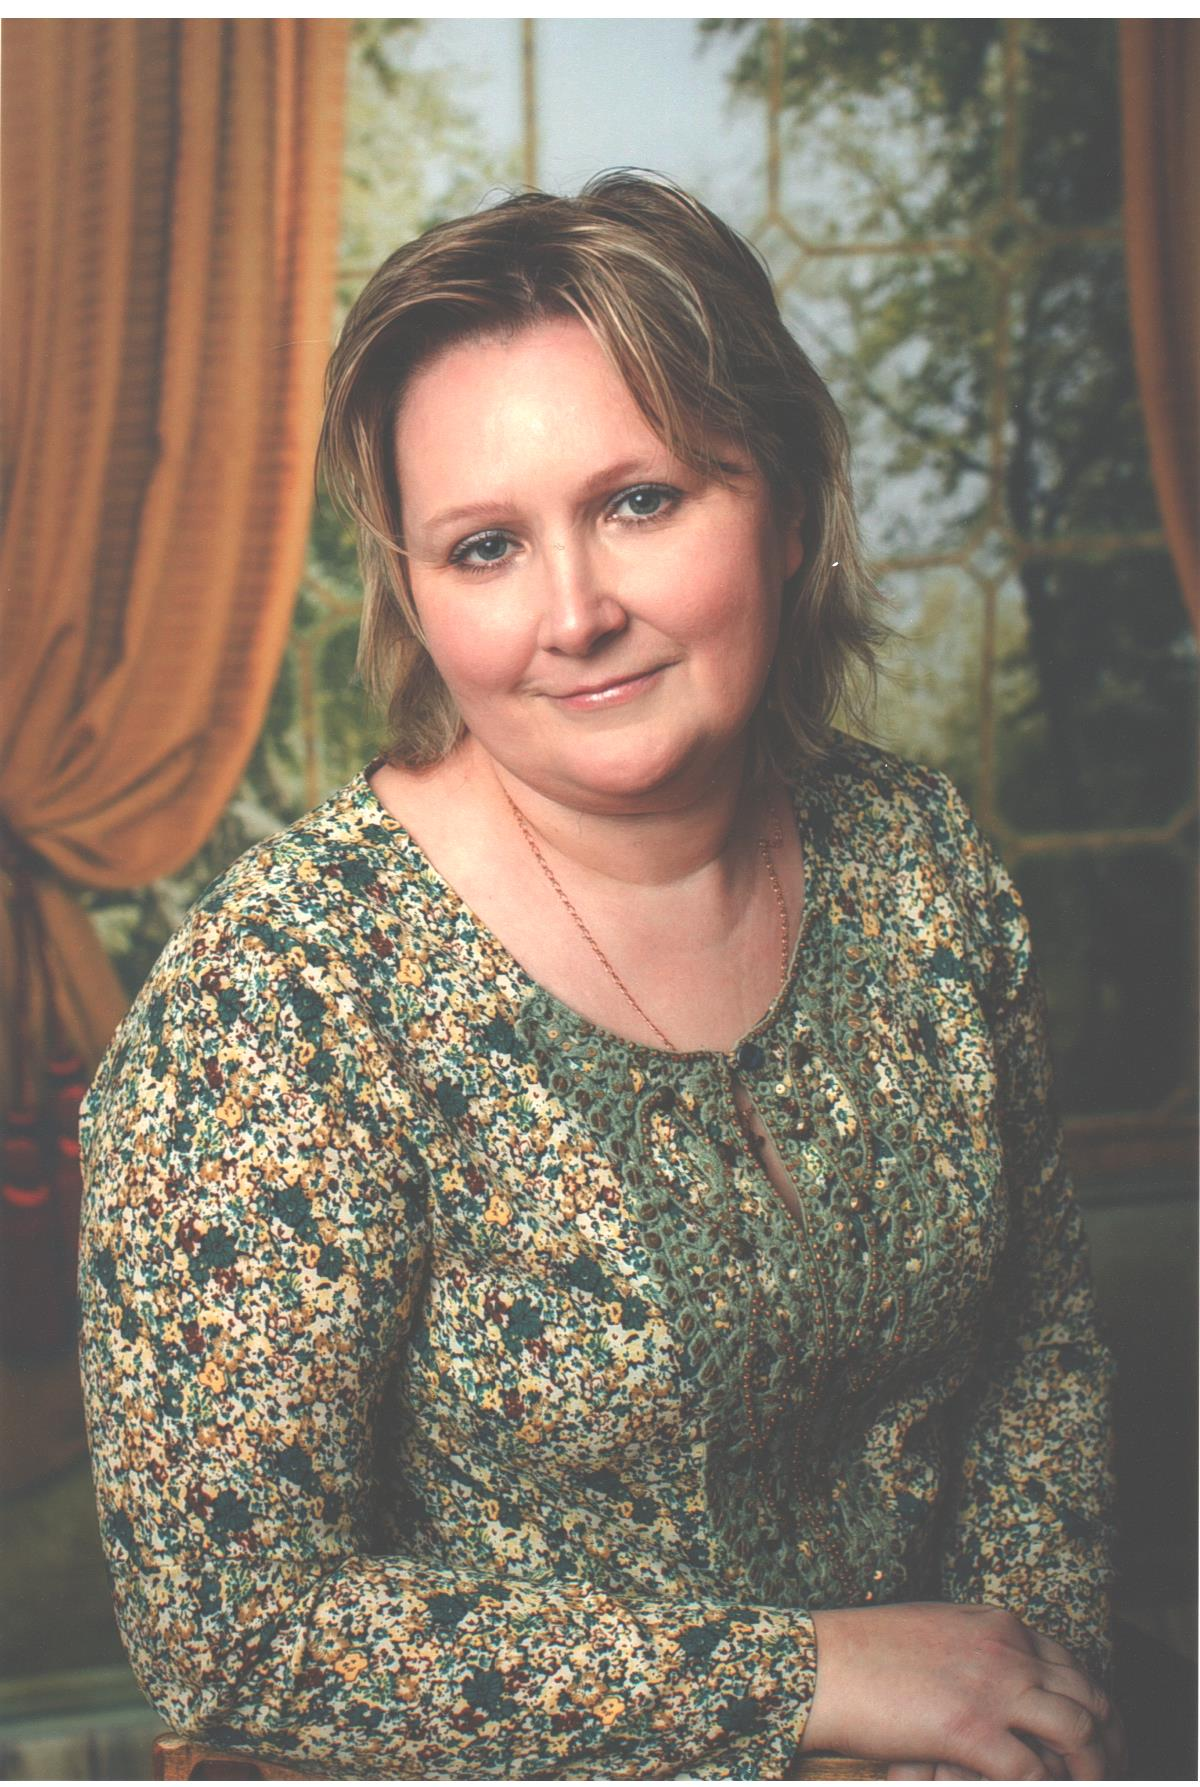 Larisa Ivanovna